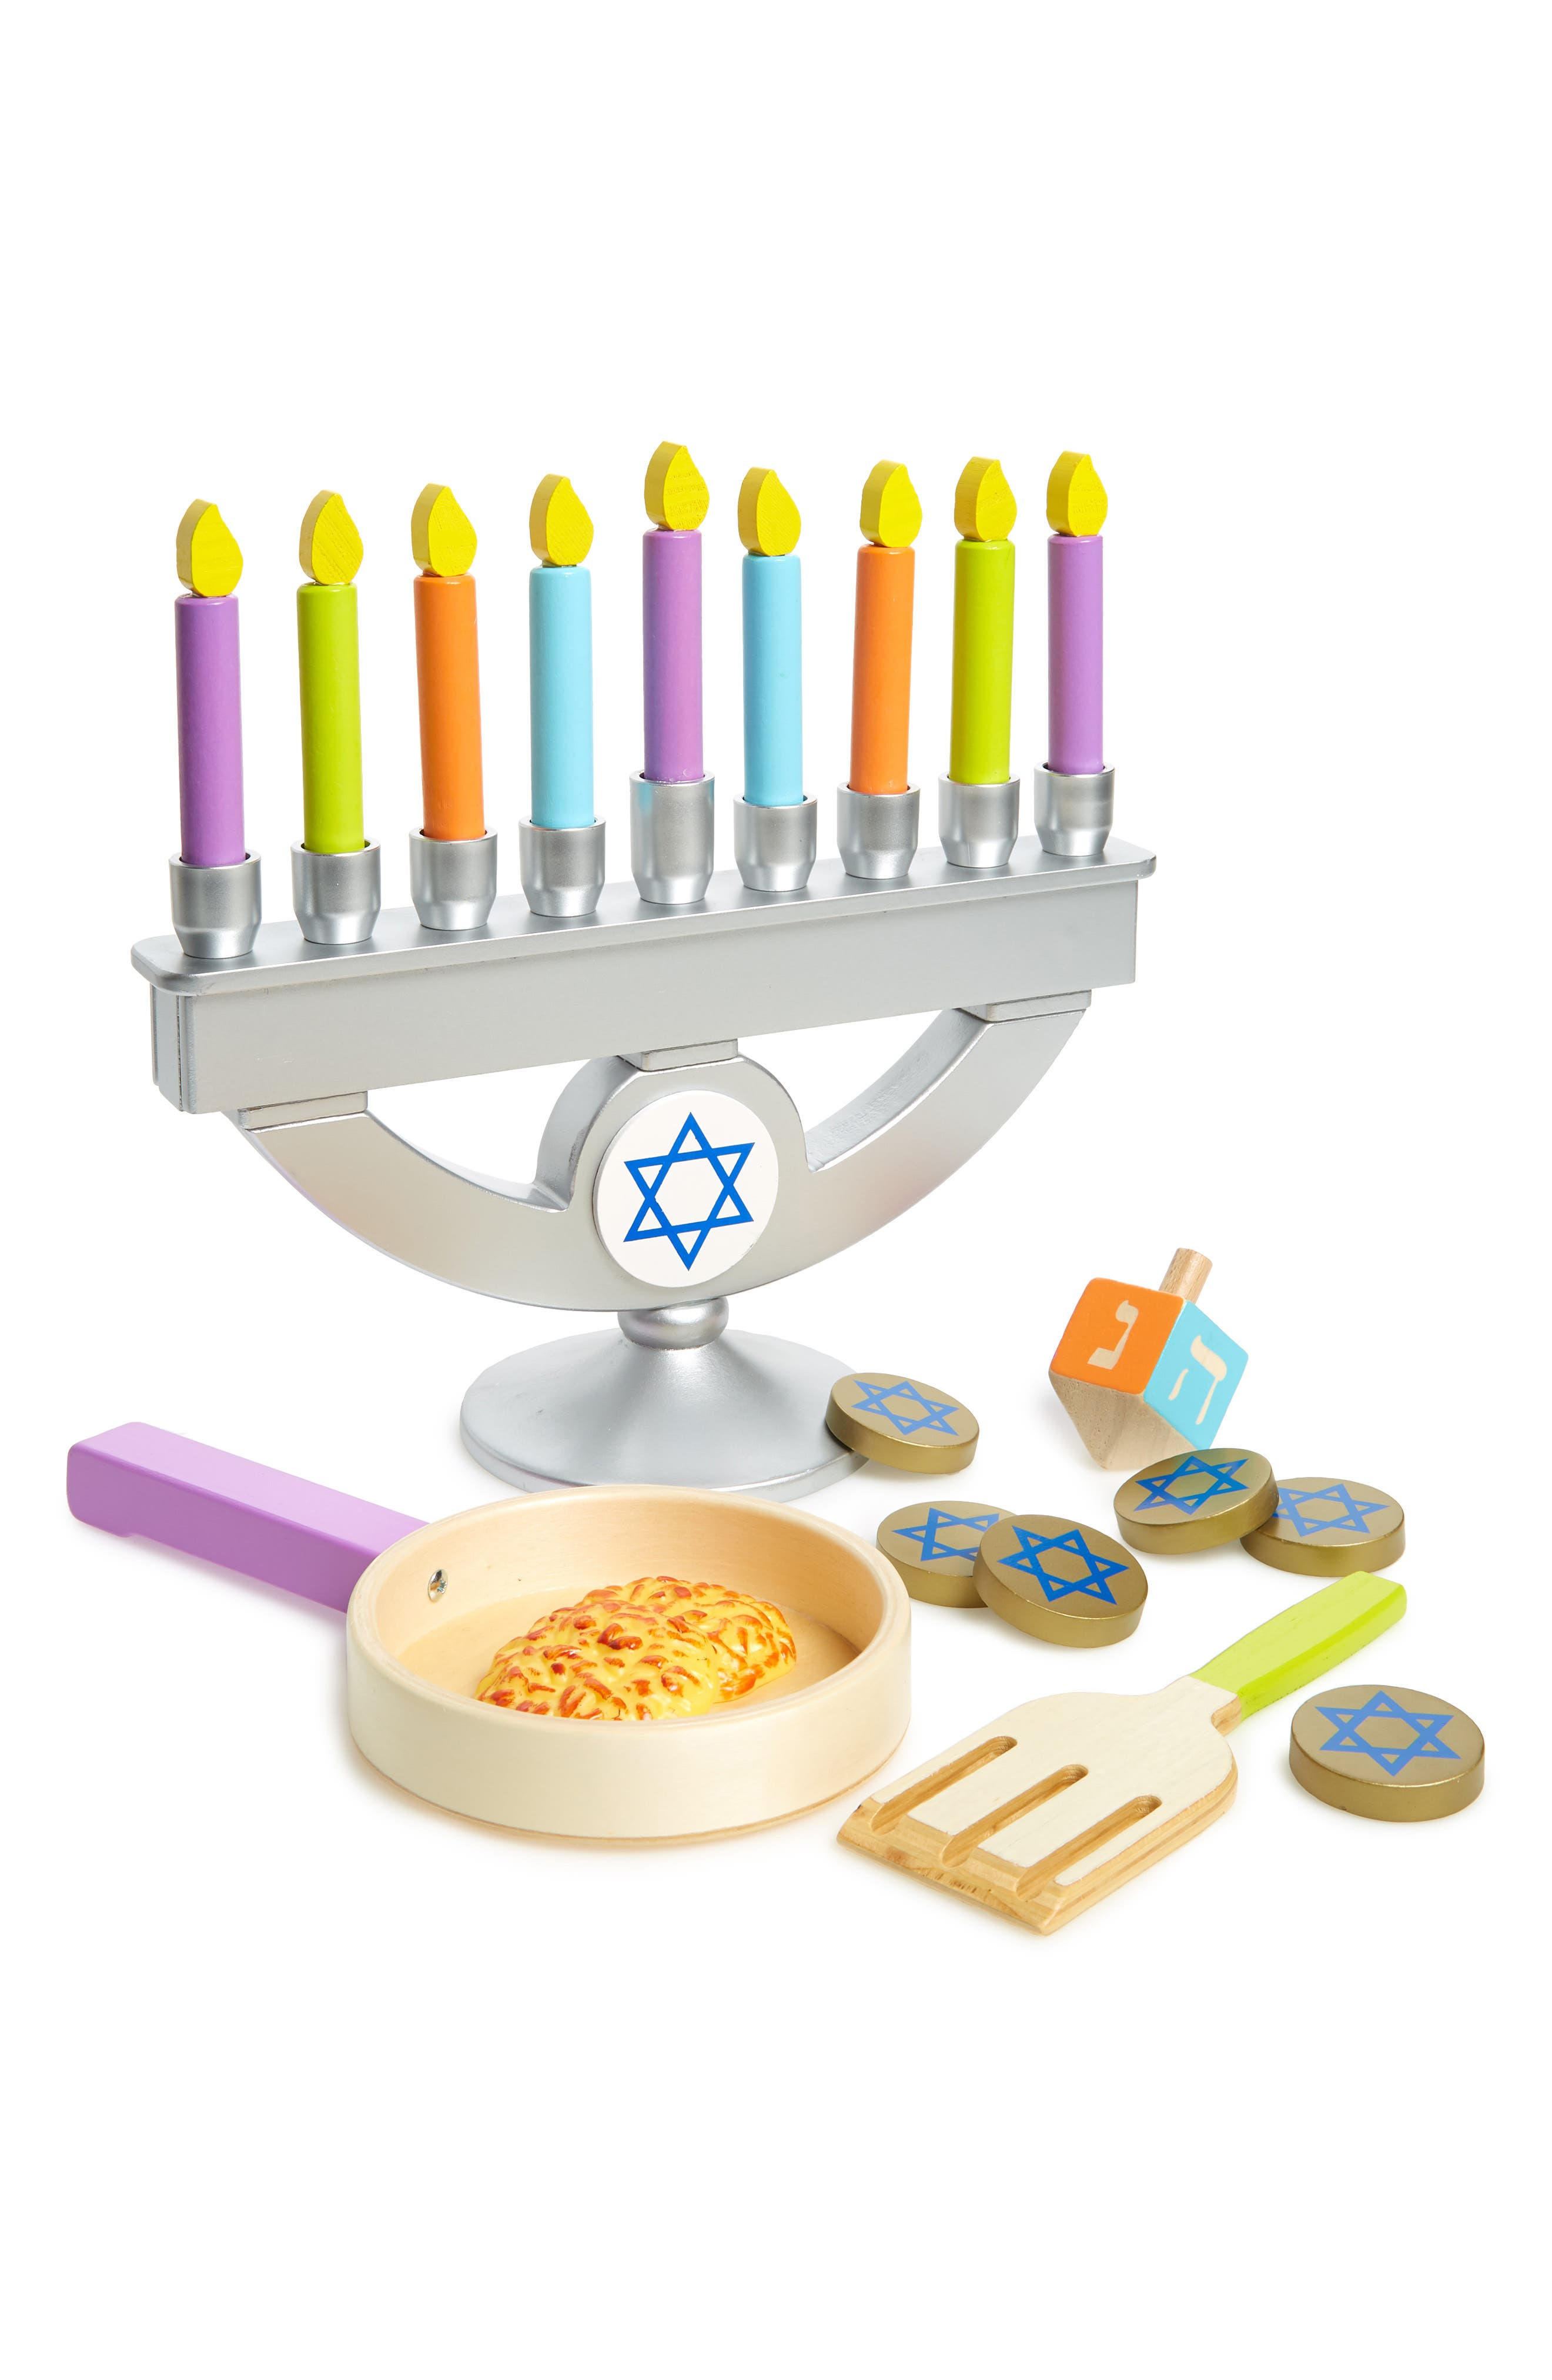 Kidkraft Hanukkah Play Set